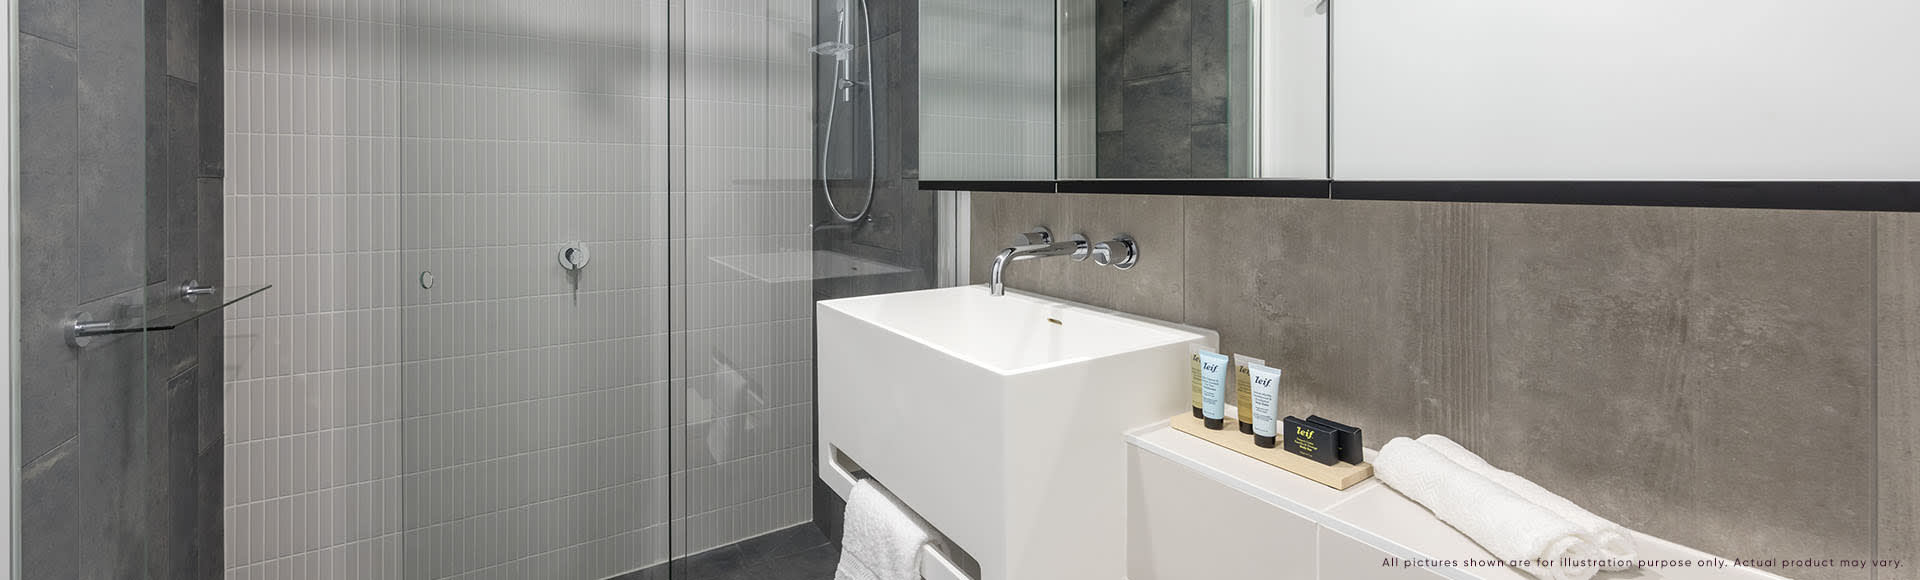 Avani Box Hill 1 Bedroom Suite Bathroom 1920x580px